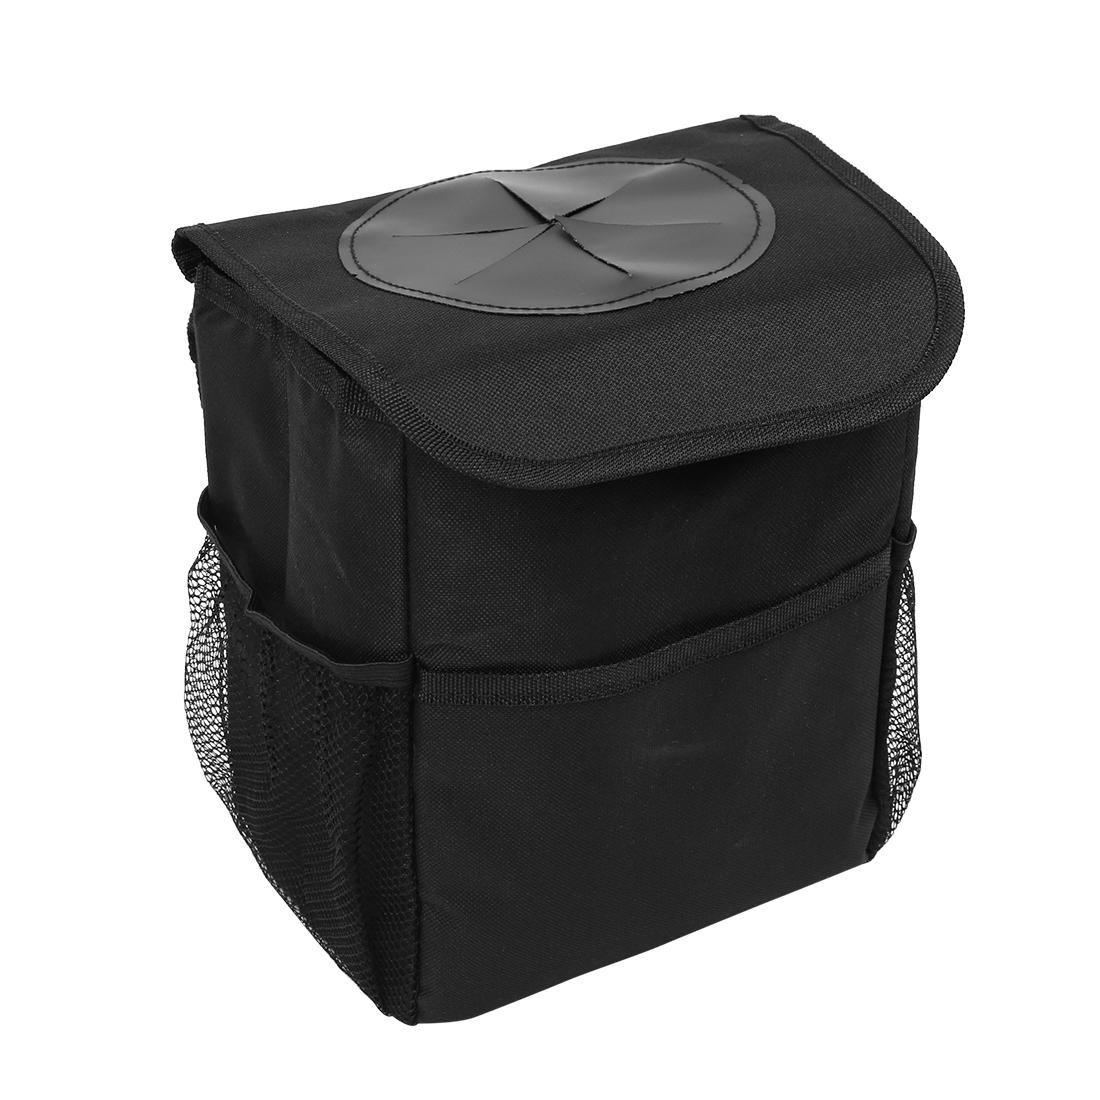 22x14x23cm Car Waterproof Trash Storage Bag Holder Backseat Hanging Design